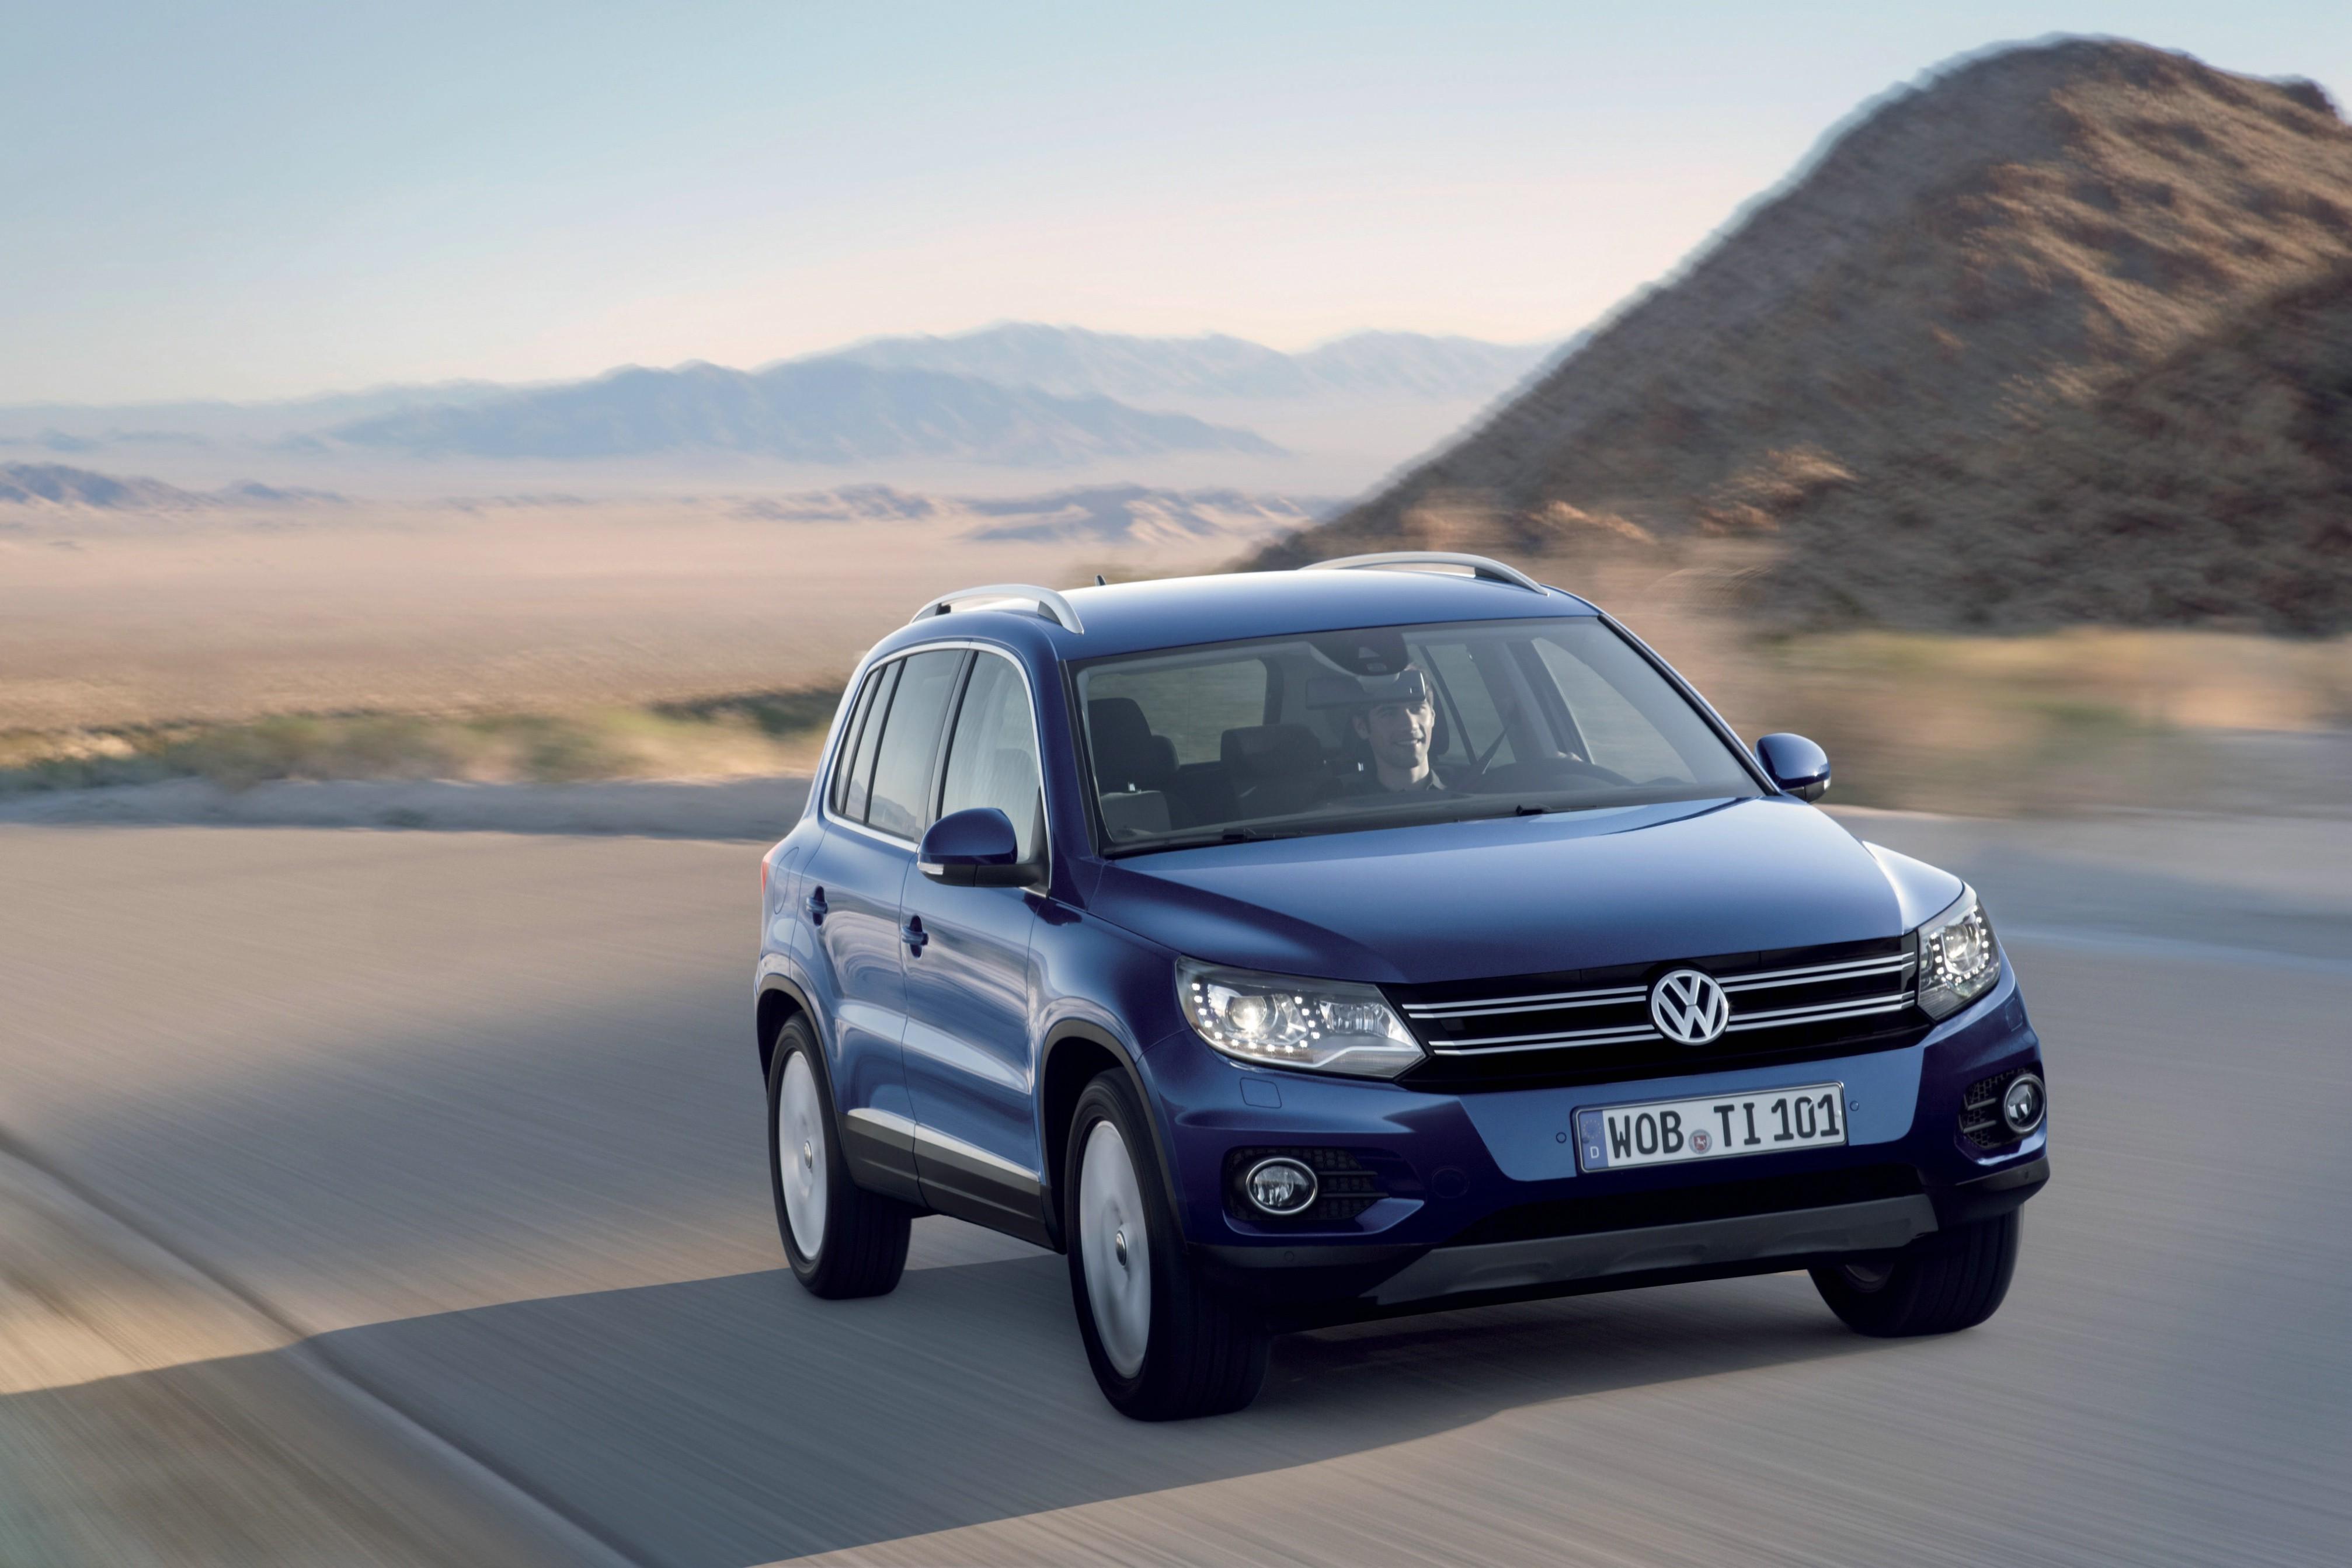 Volkswagen Tiguan Specs Photos 2011 2012 2013 2014 2015 Fuse Box 2016